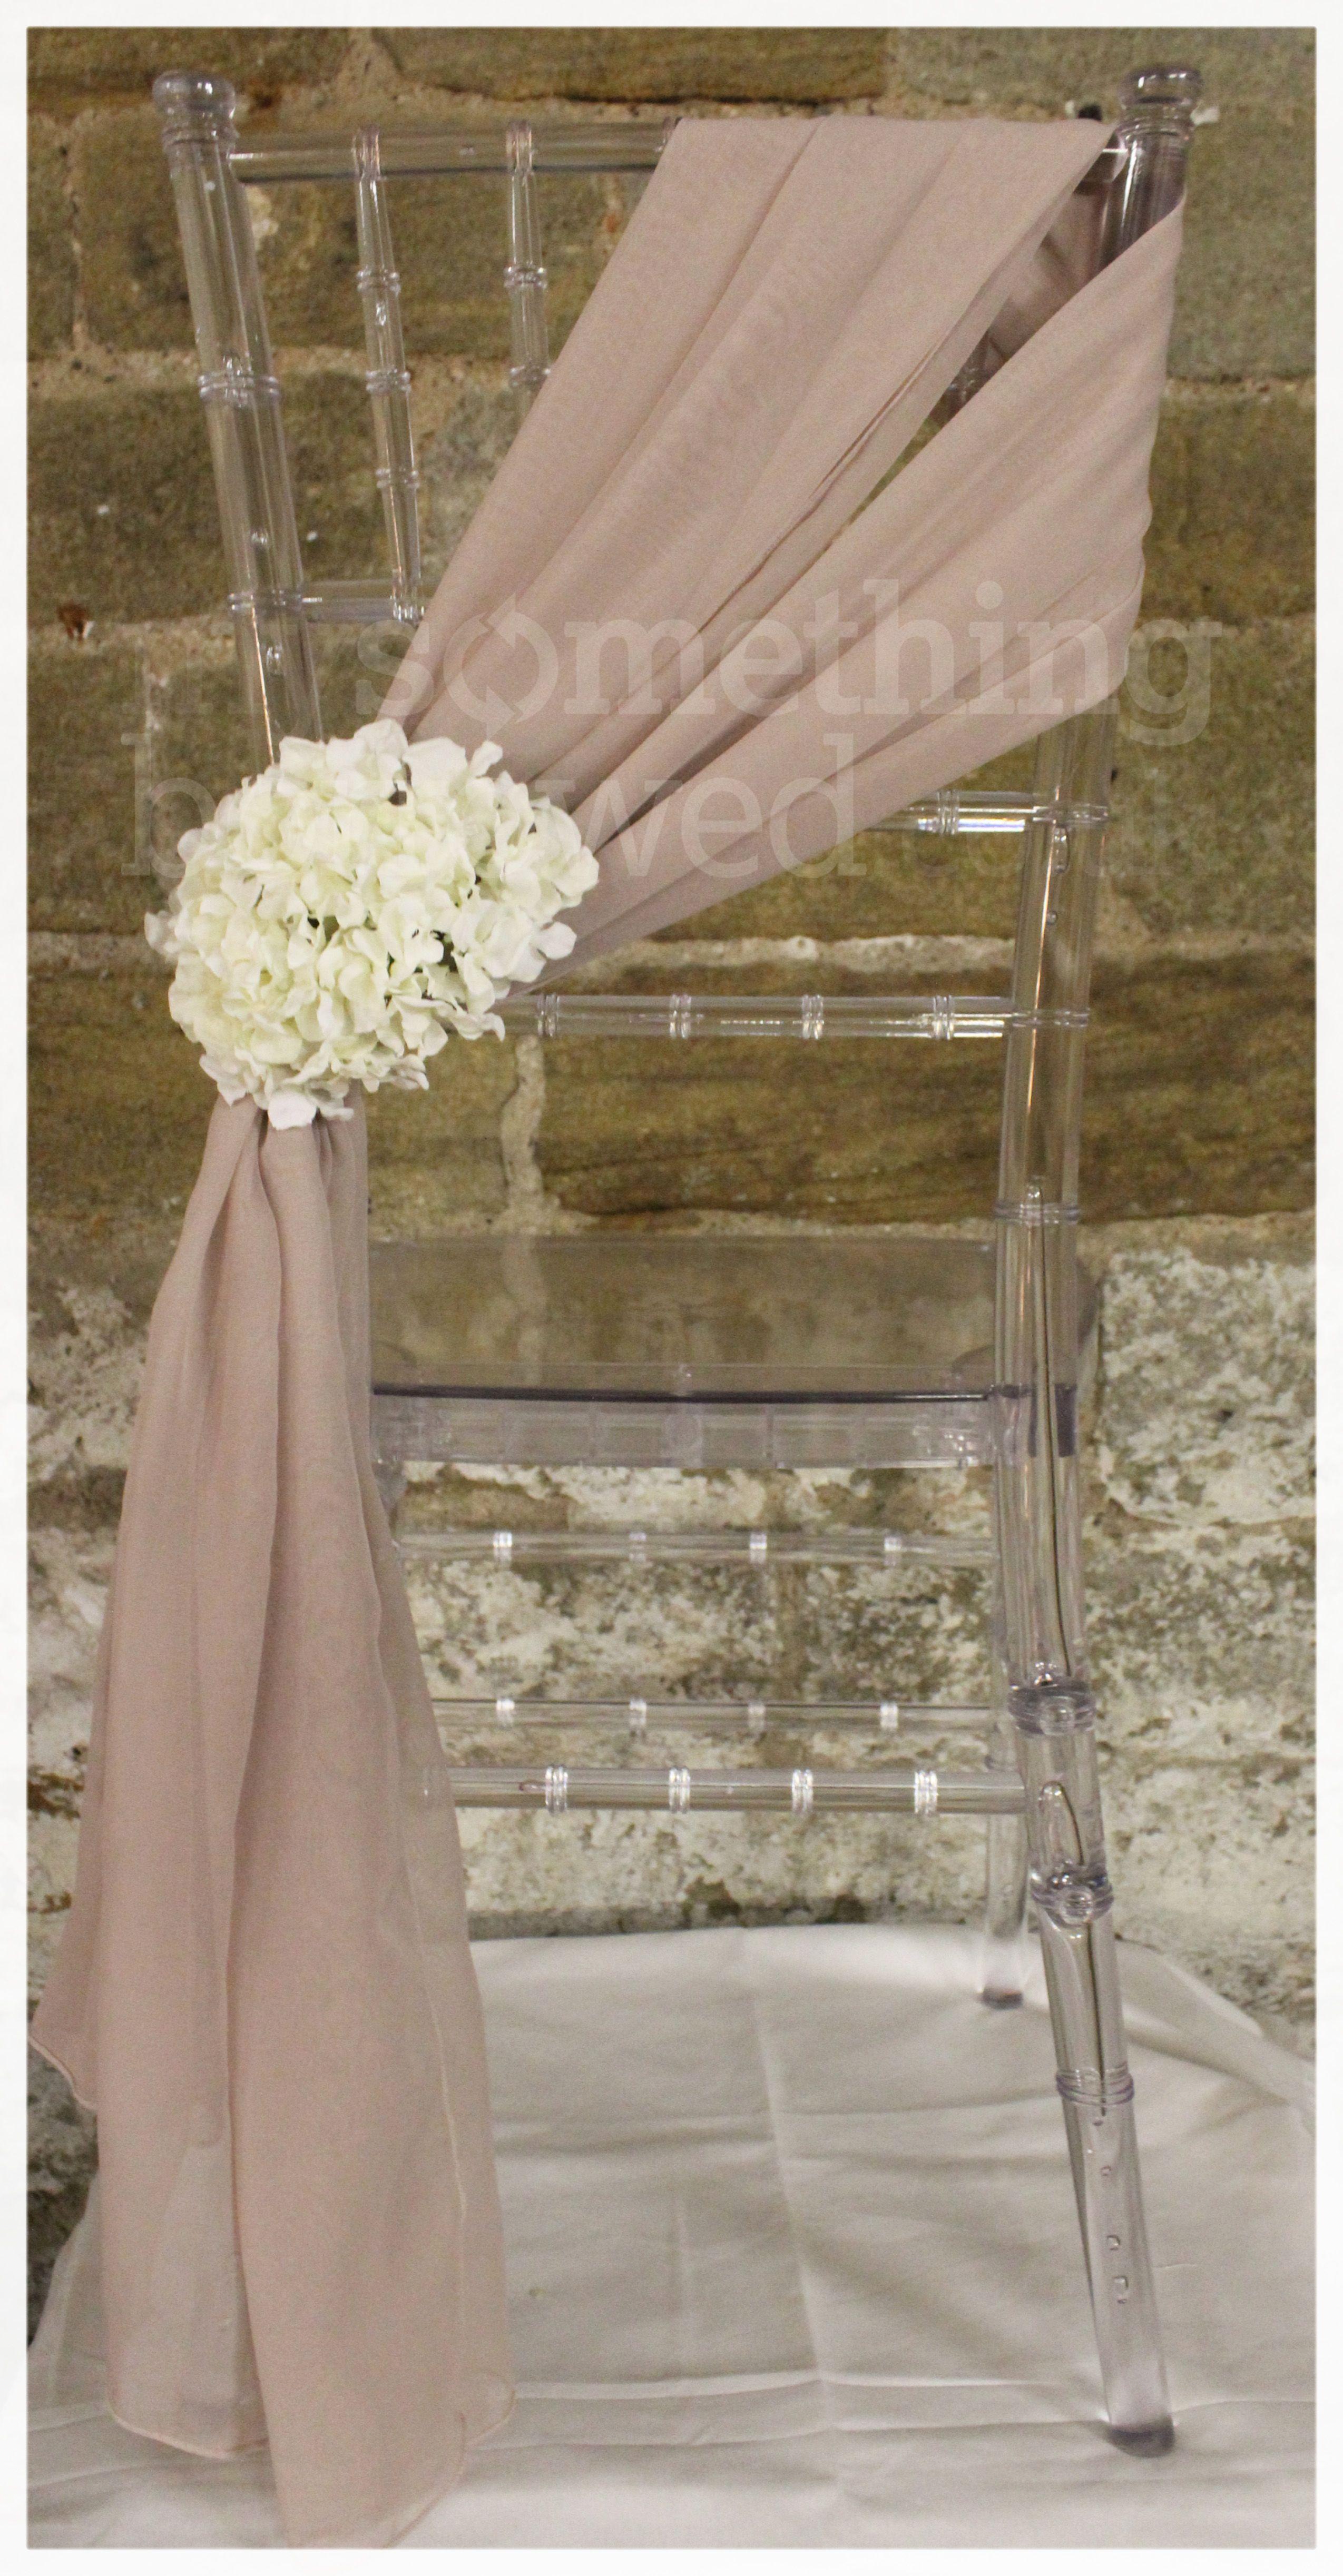 Fine An Elegant Blush Chiffon Chair Tie Adorned With Ivory Cjindustries Chair Design For Home Cjindustriesco